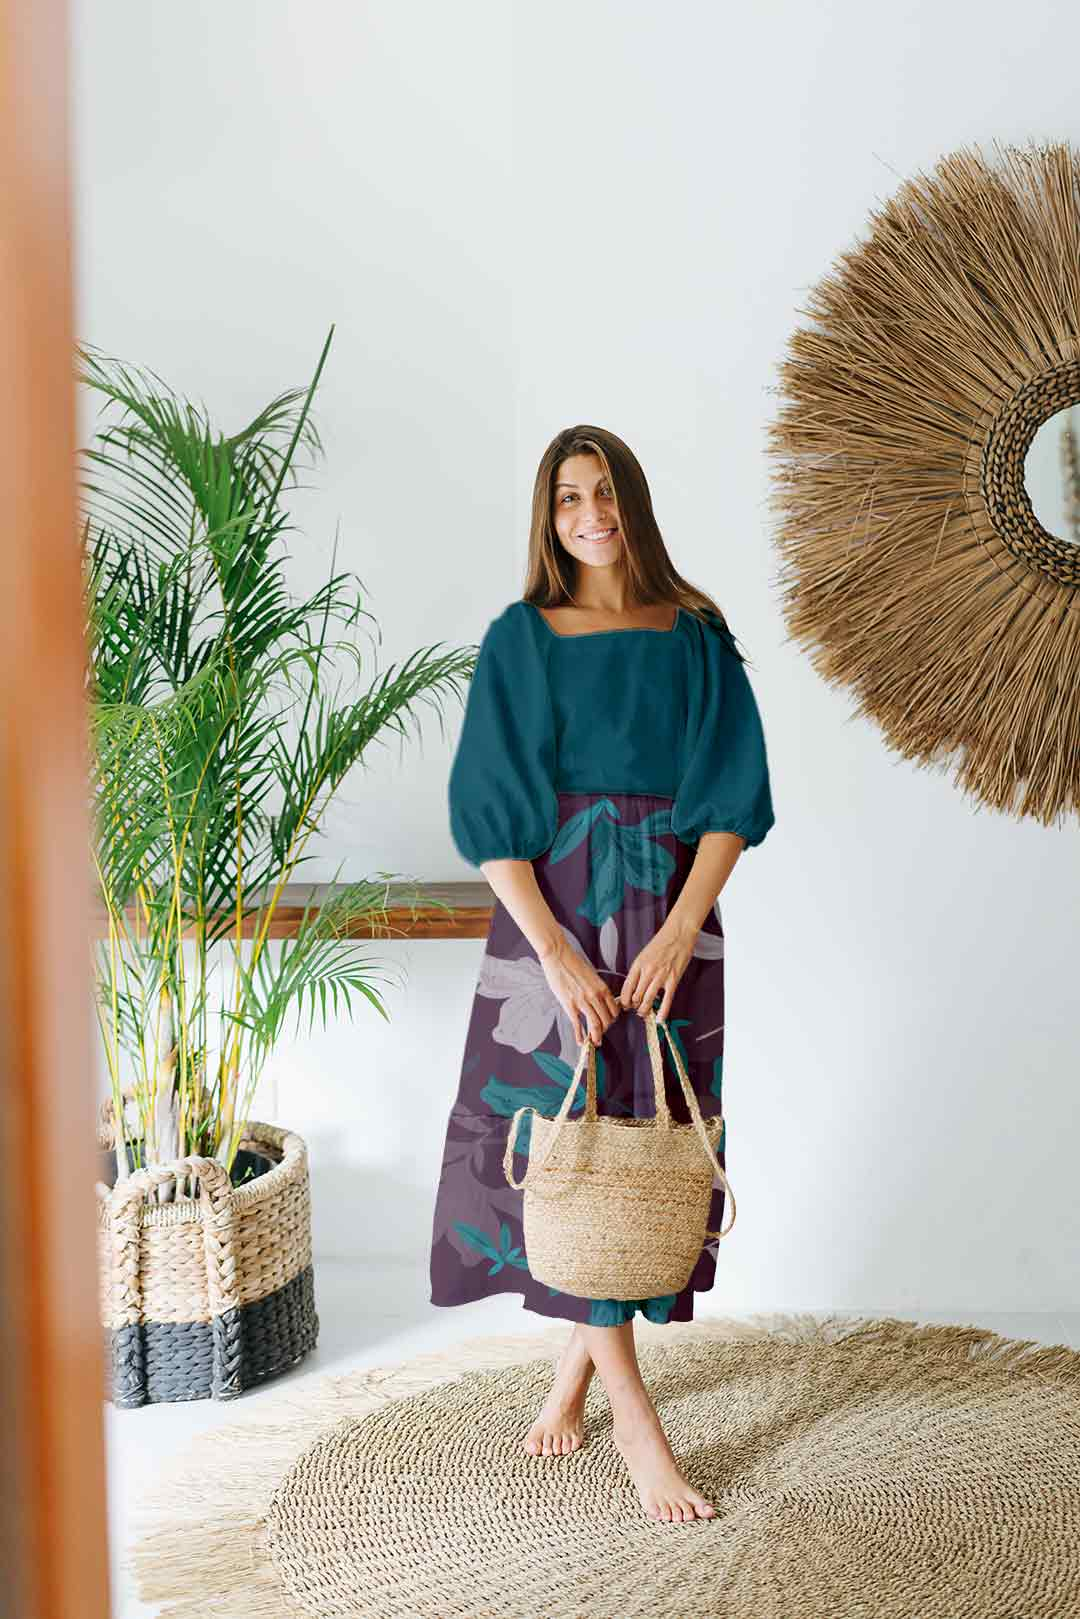 Cotton Frock Style Dress – Turquoise Splash